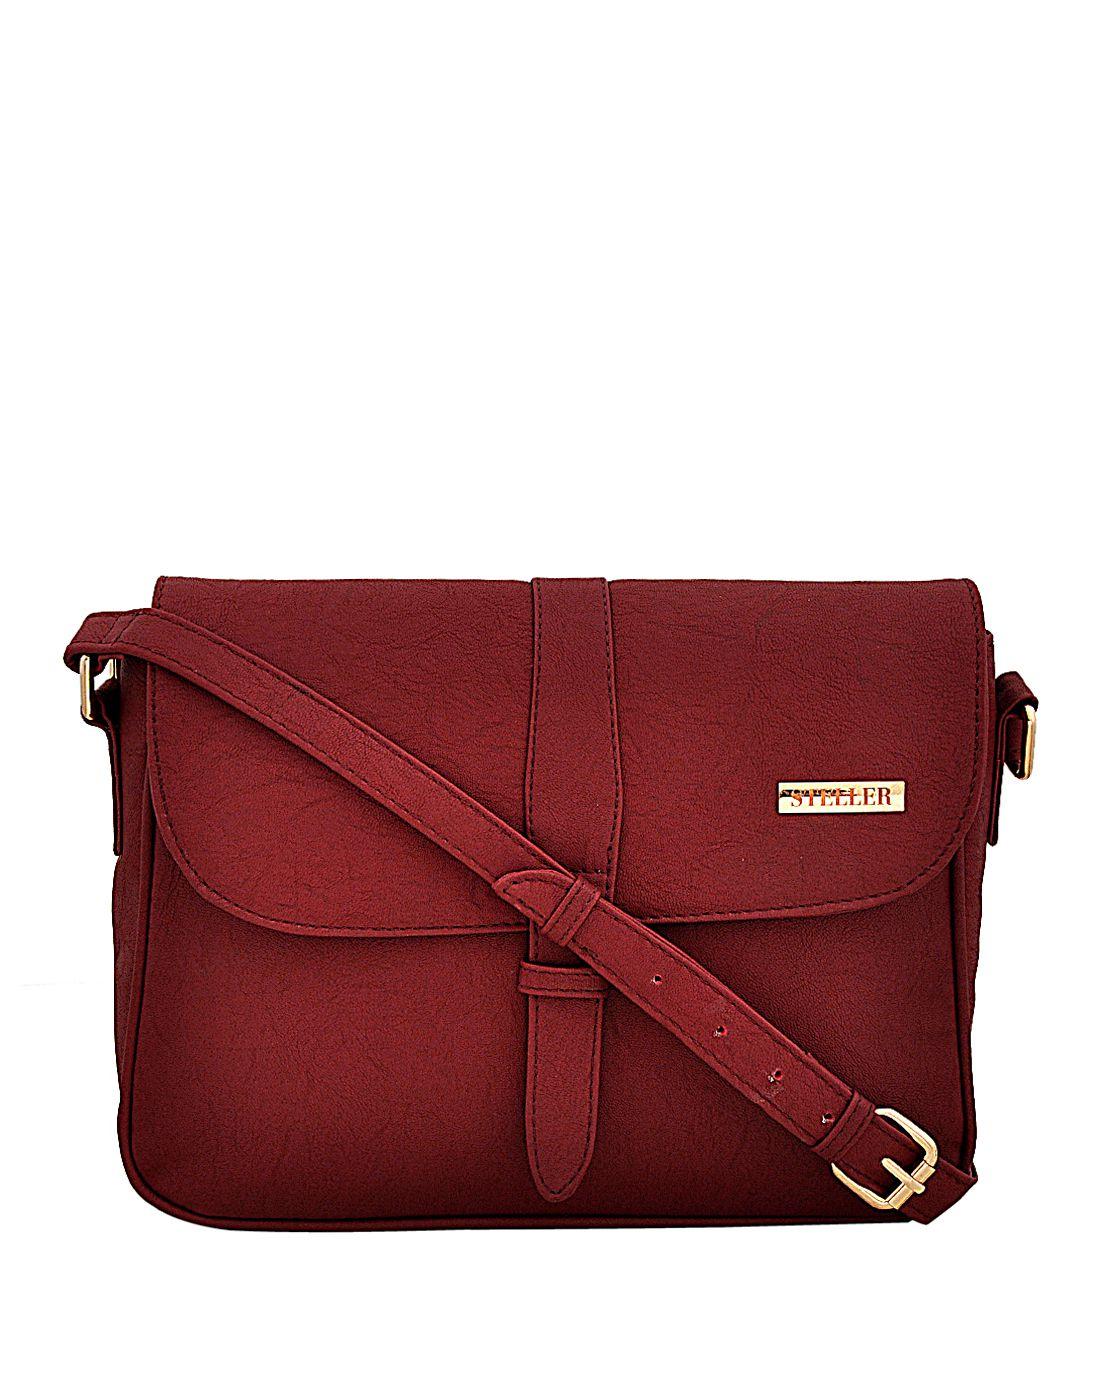 Steller Maroon Faux Leather Sling Bag